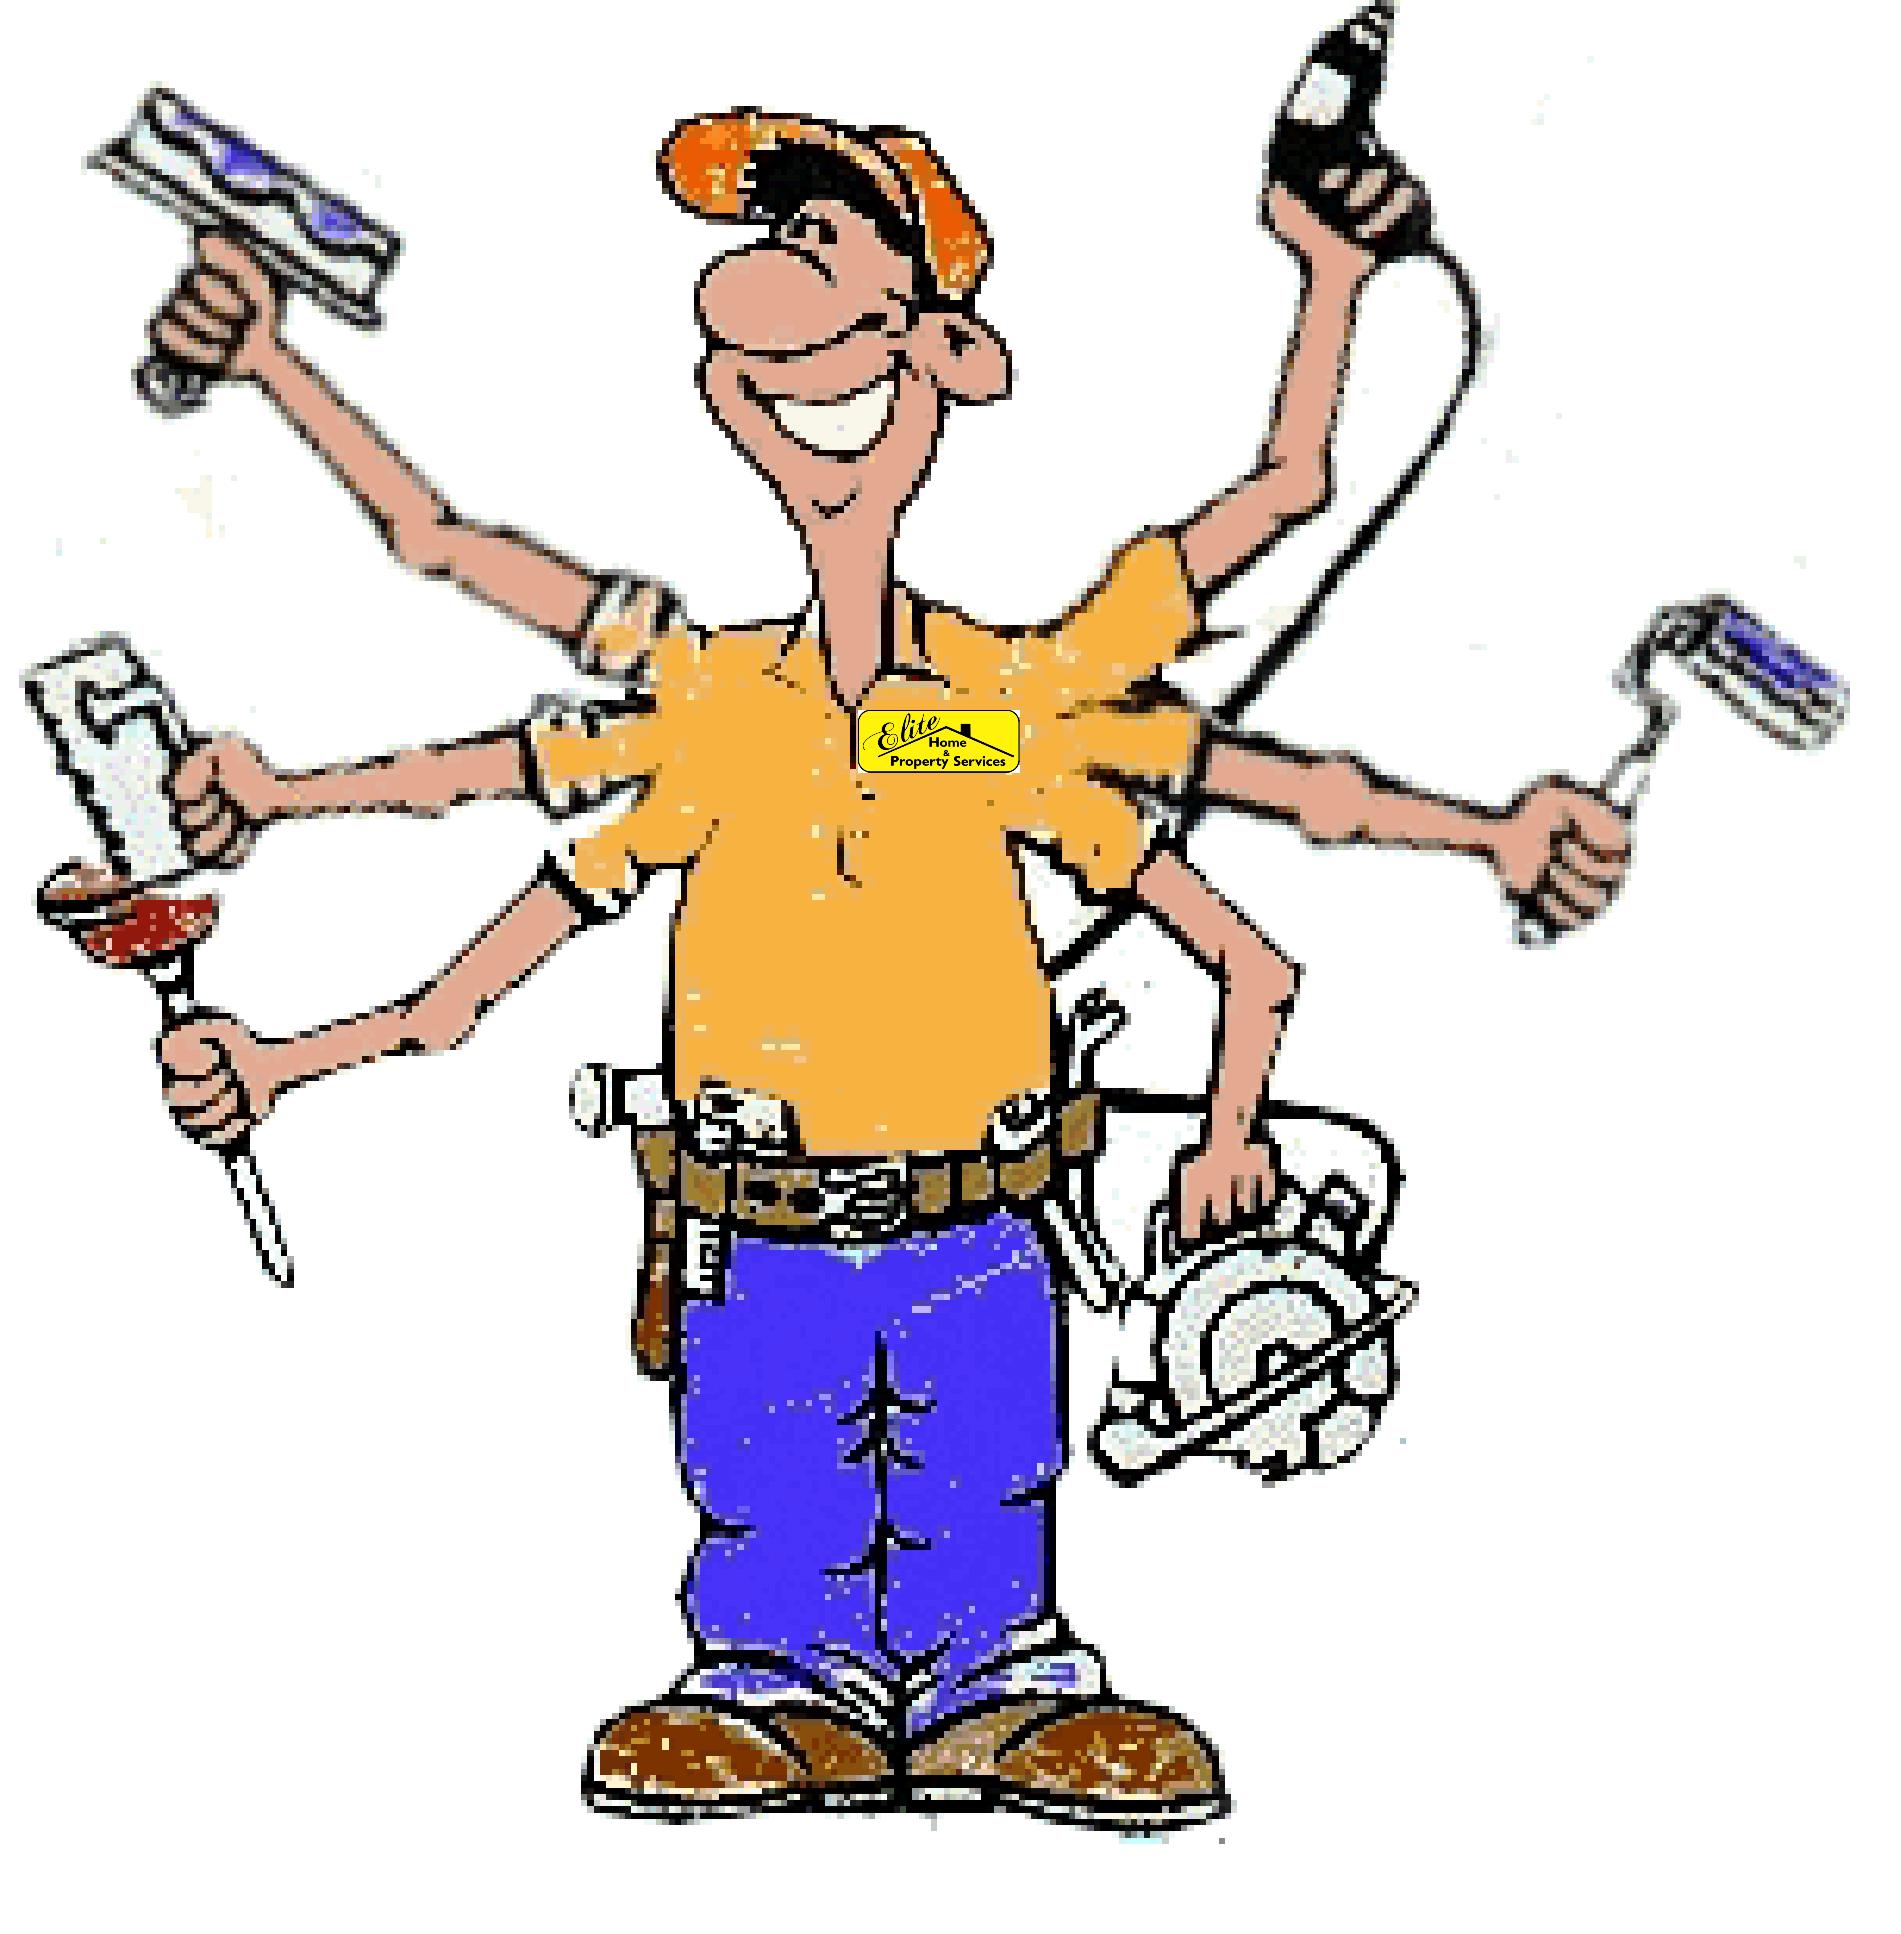 Super jpg maintenanceclipartsupermaintenancemanclipartjpg . Carpentry clipart maintenance man